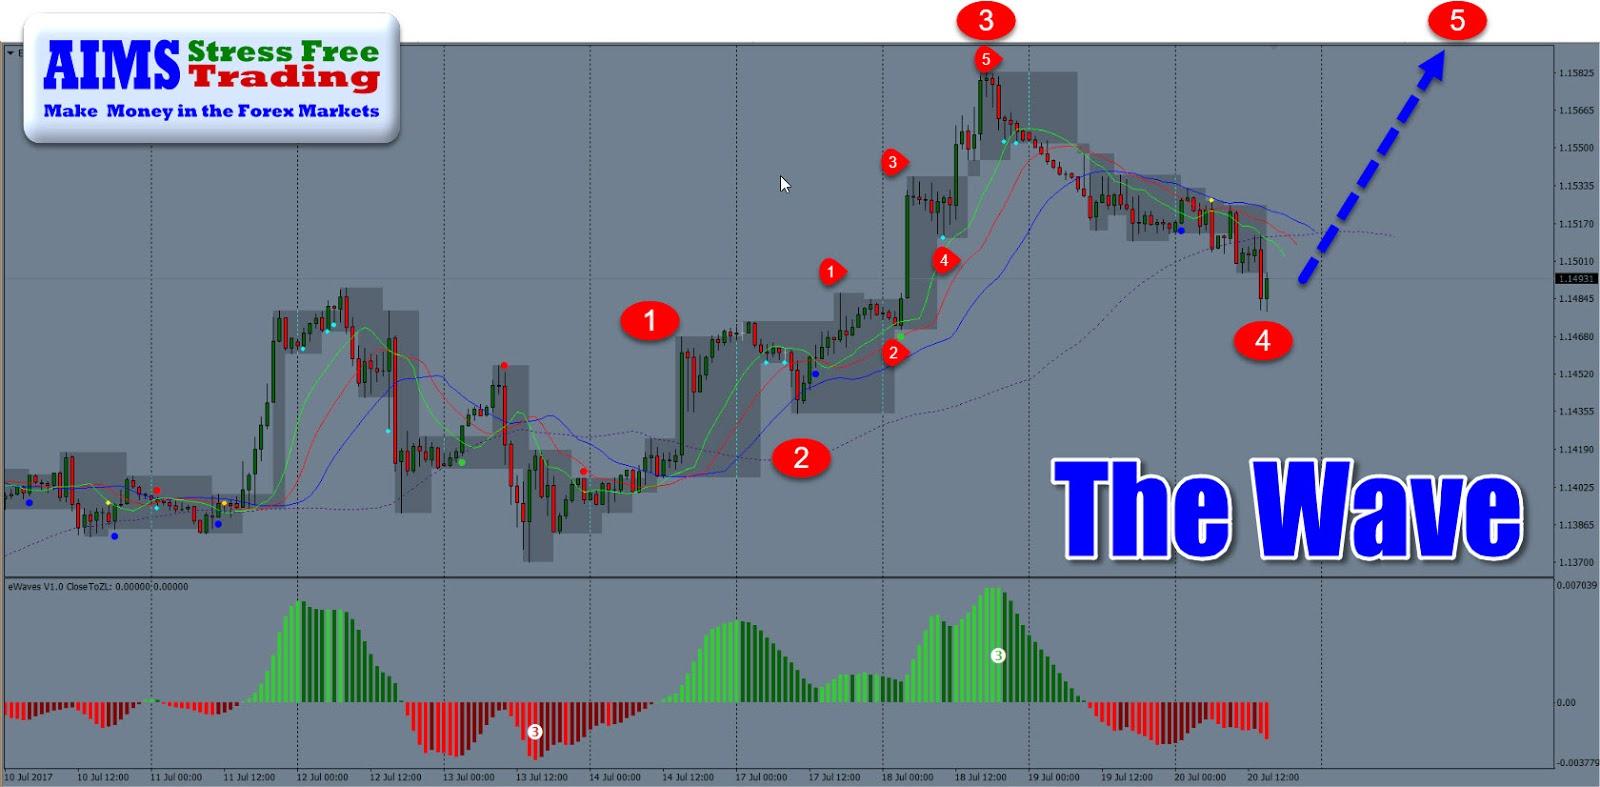 aims stress free trading pdf